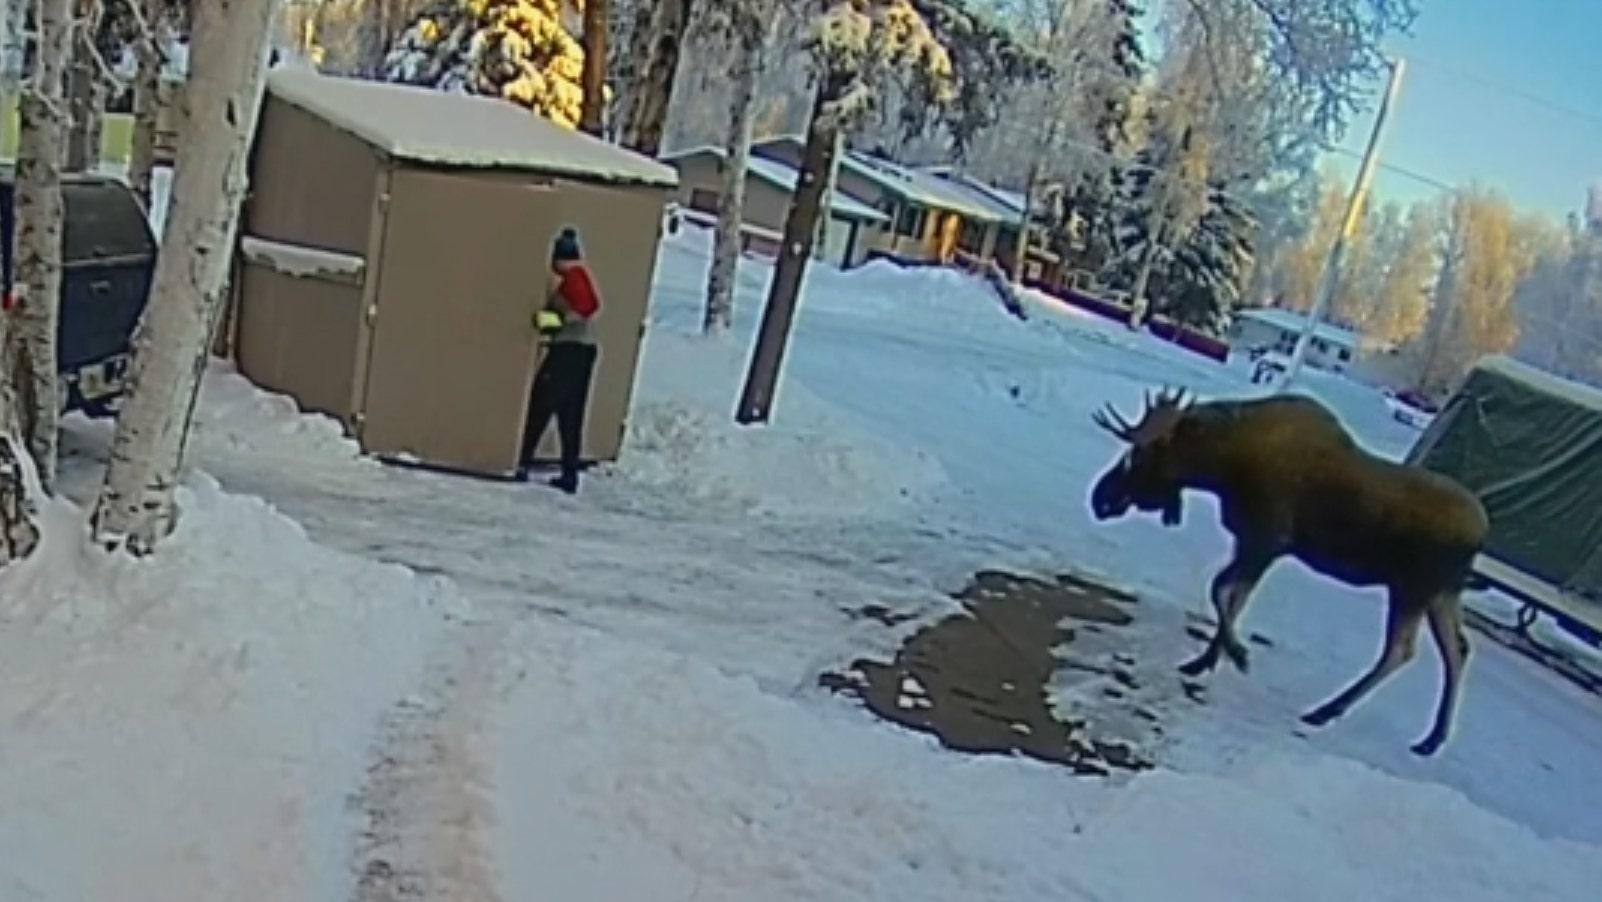 Moose traps Alaska man inside shed while he frantically calls wife, doorbell camera captures encounter